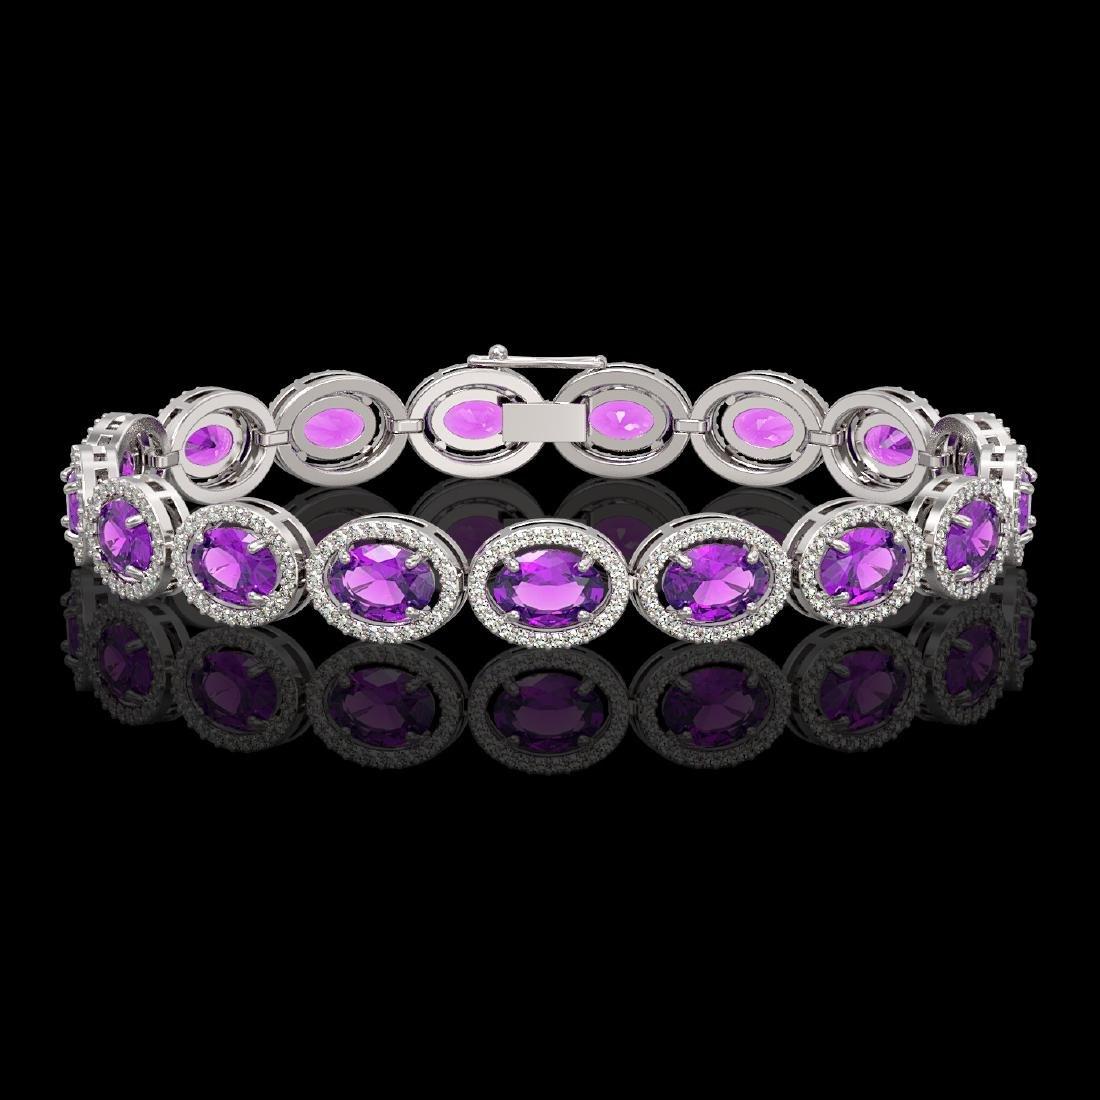 19.82 CTW Amethyst & Diamond Halo Bracelet 10K White